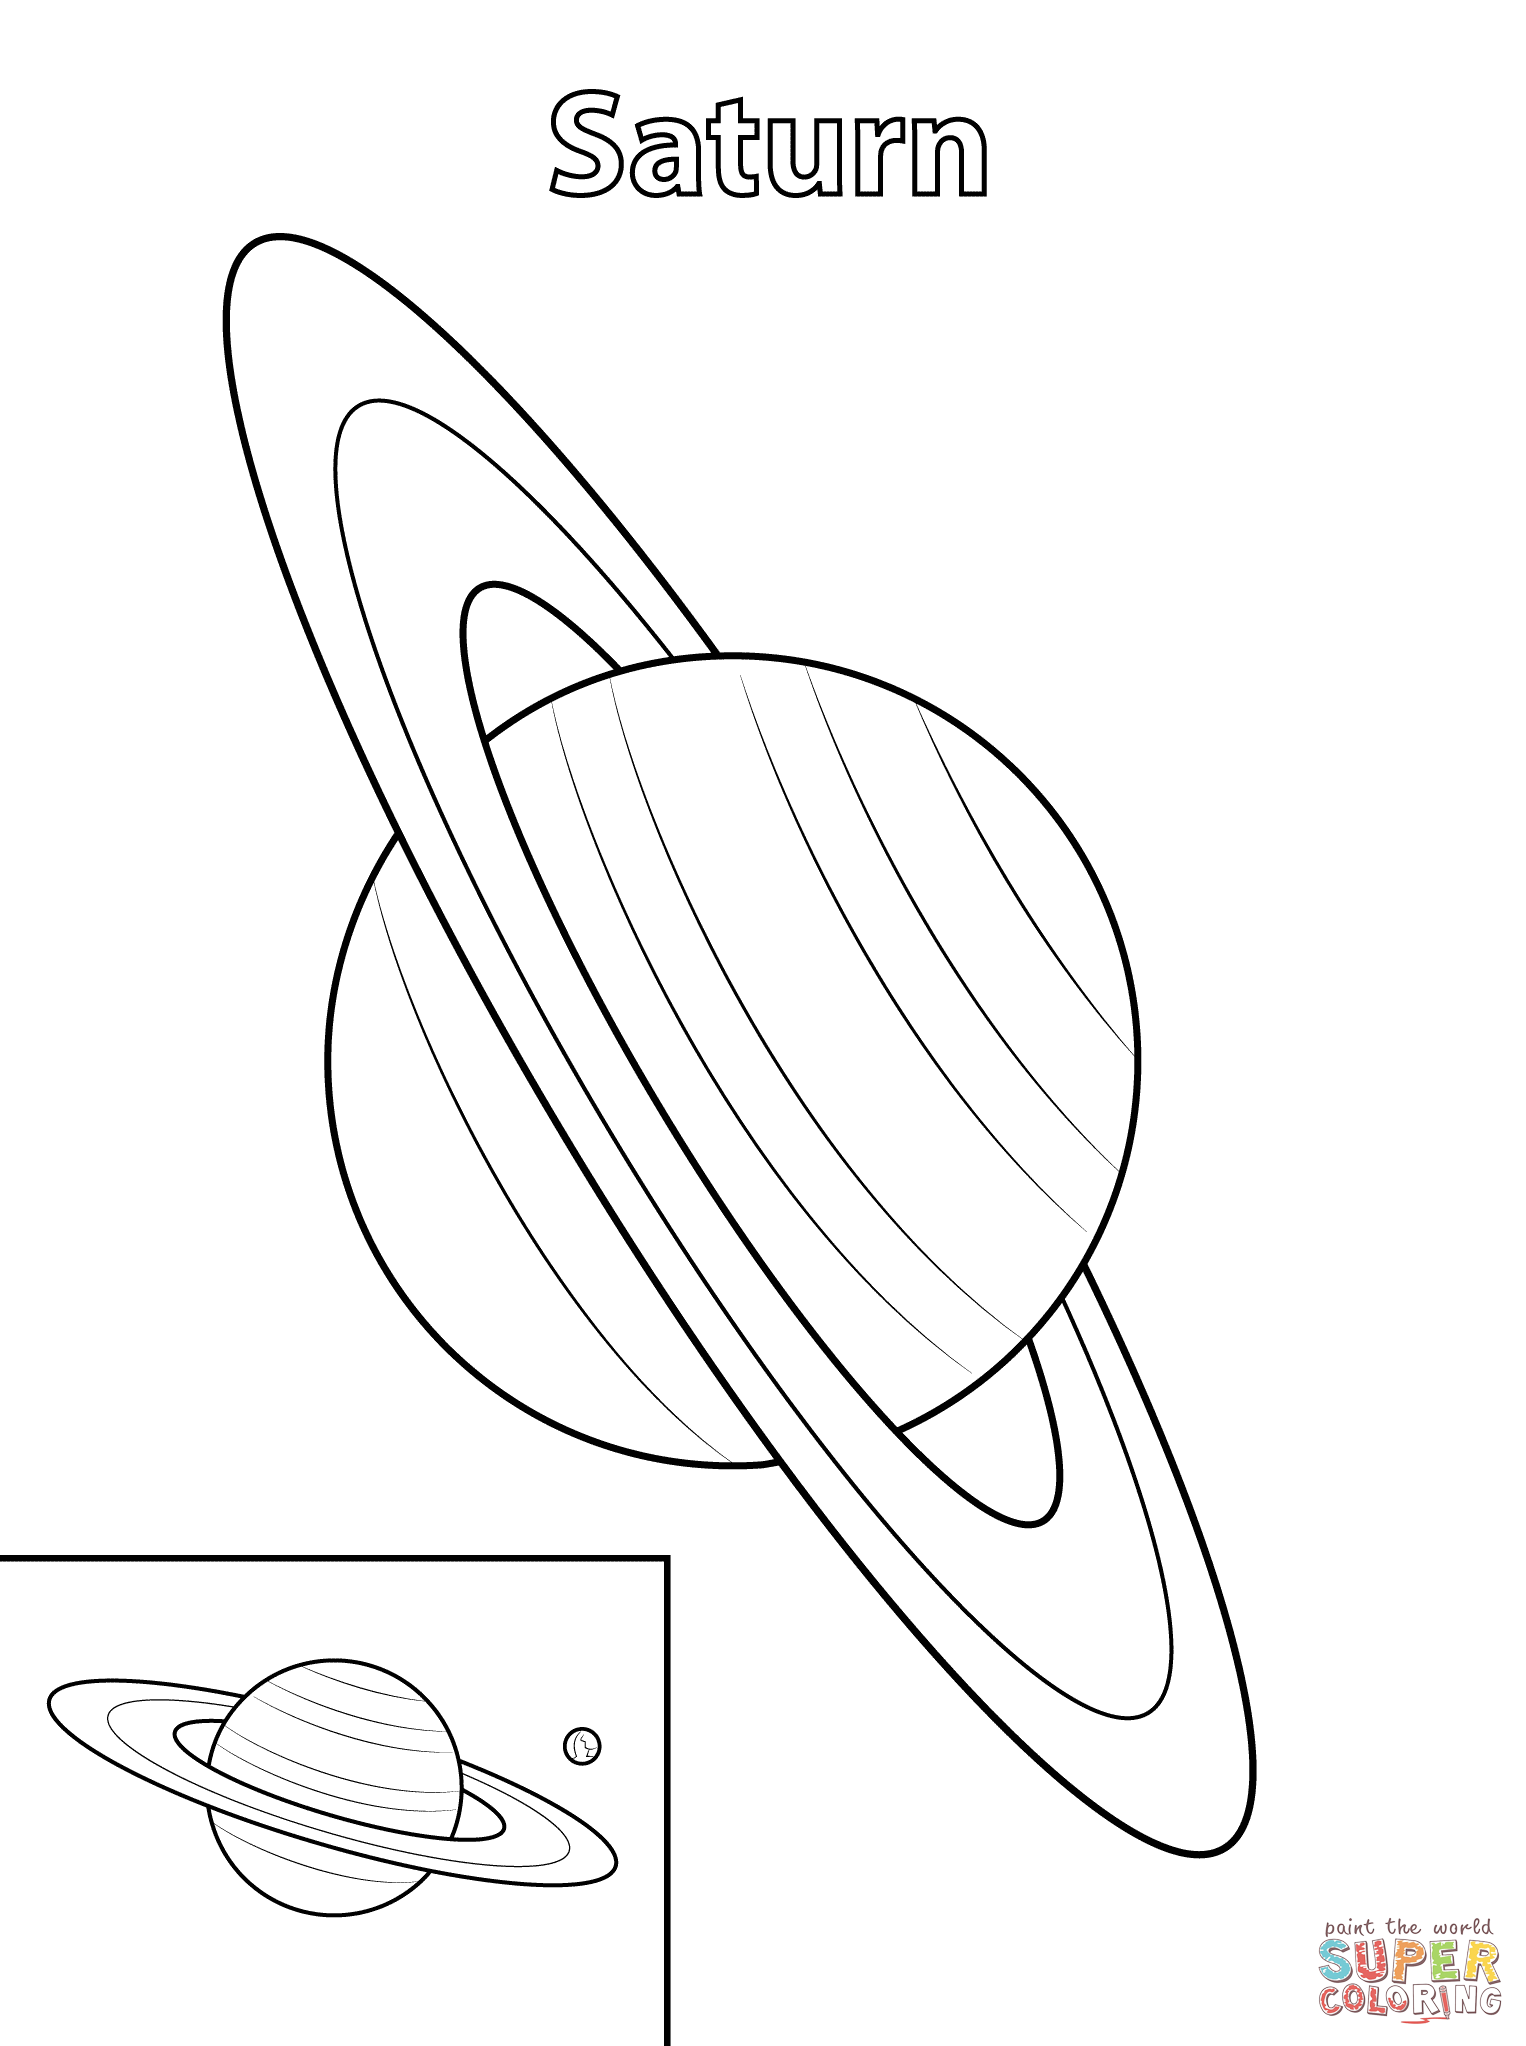 jupiter planet drawing at getdrawings free